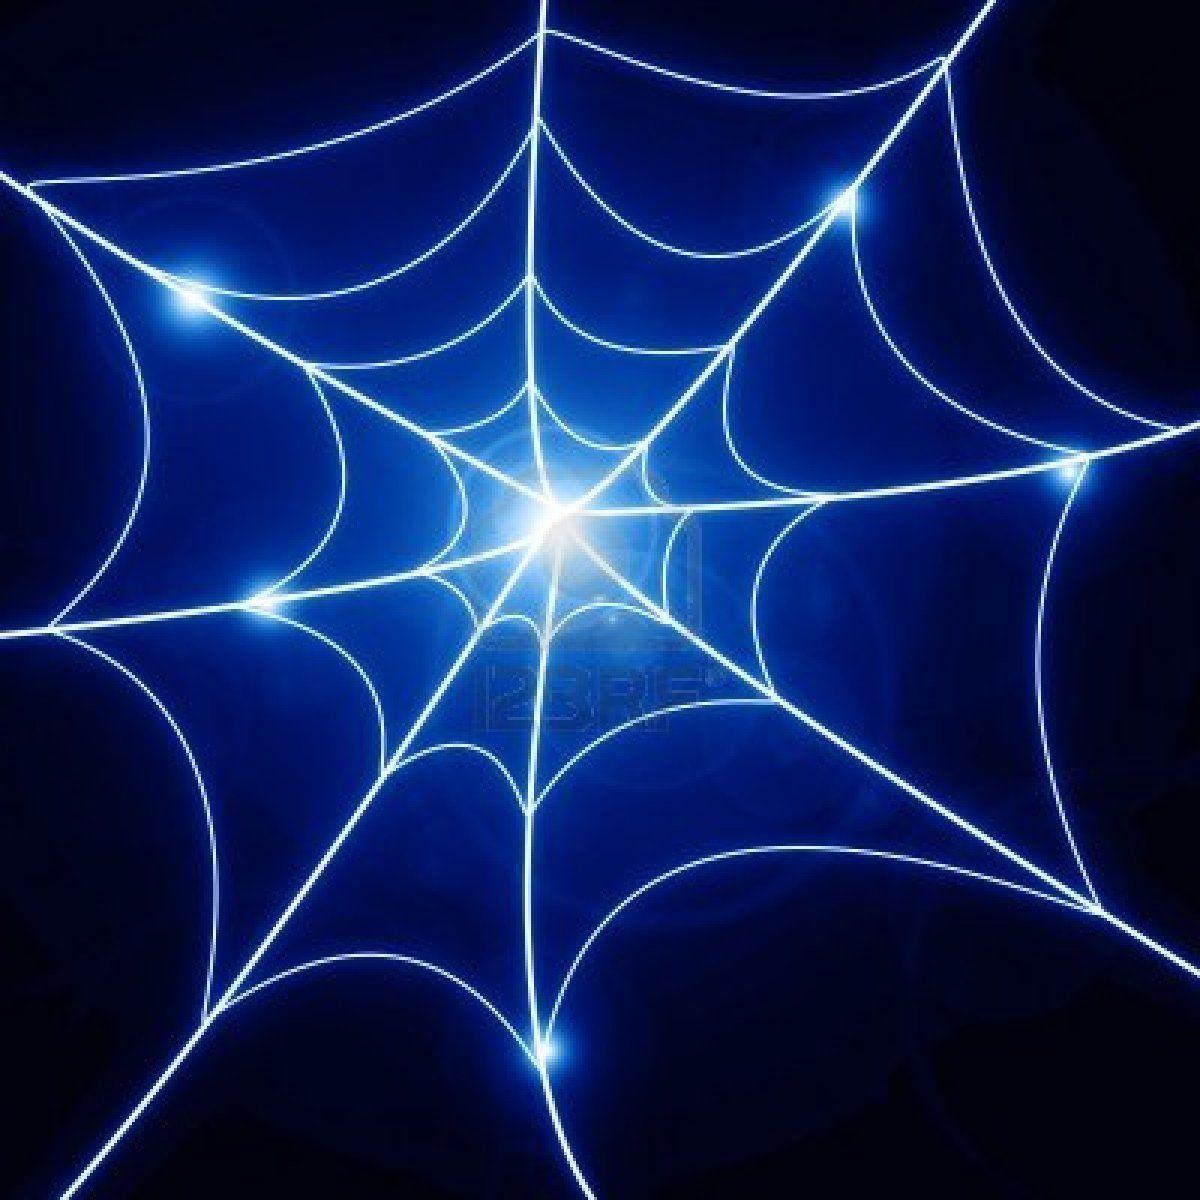 Spider Web. Janoskians Dirty Imagines Wattpad. View Original